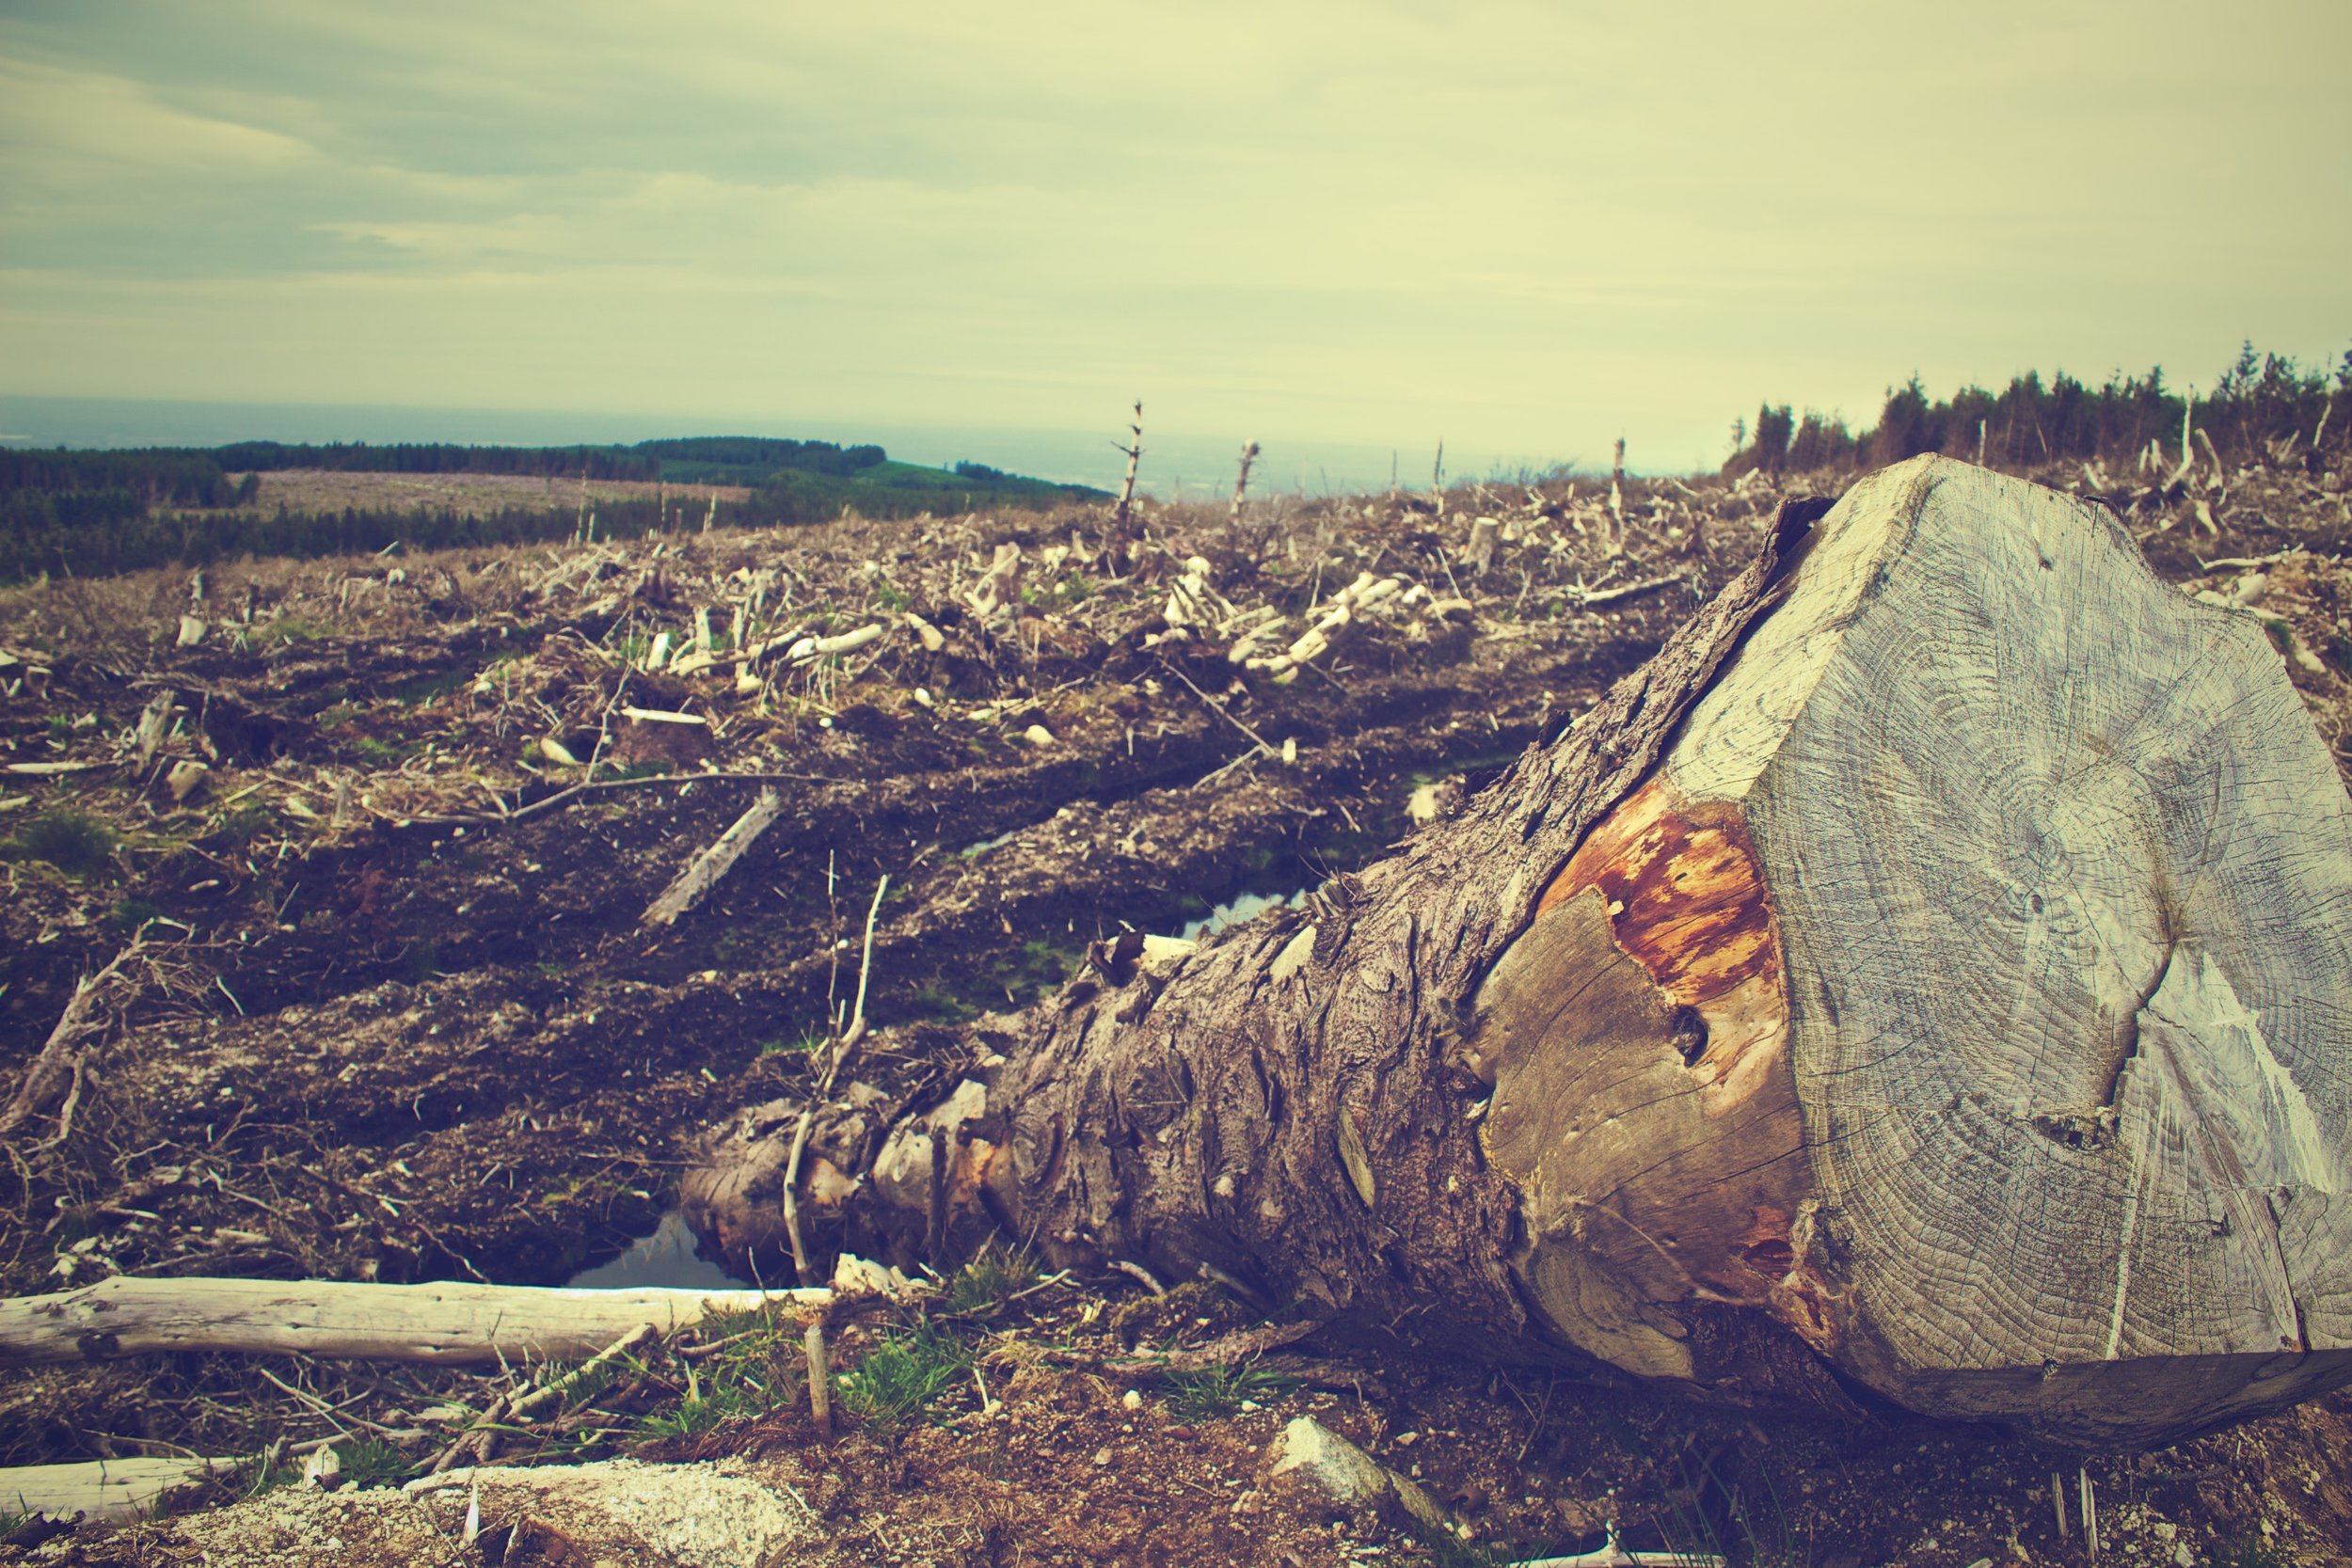 clearing-desolation-destruction-4451.jpg